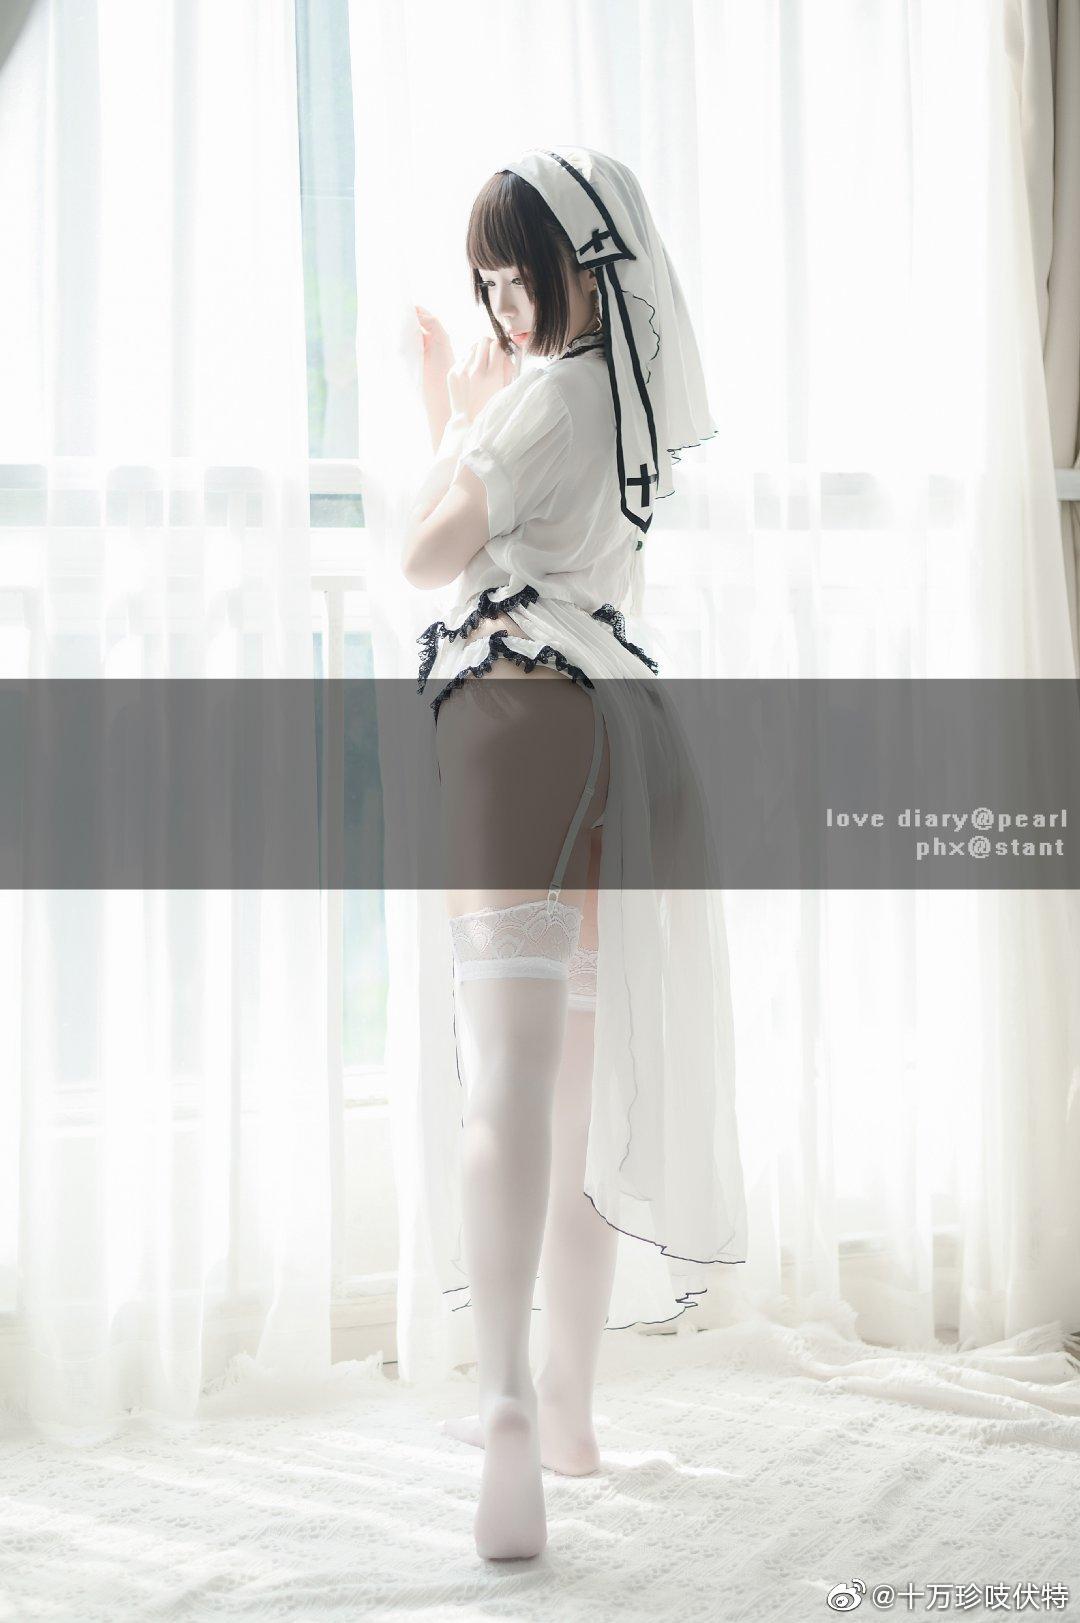 LOVE DIARY 白丝修女 Cosplay-第1张